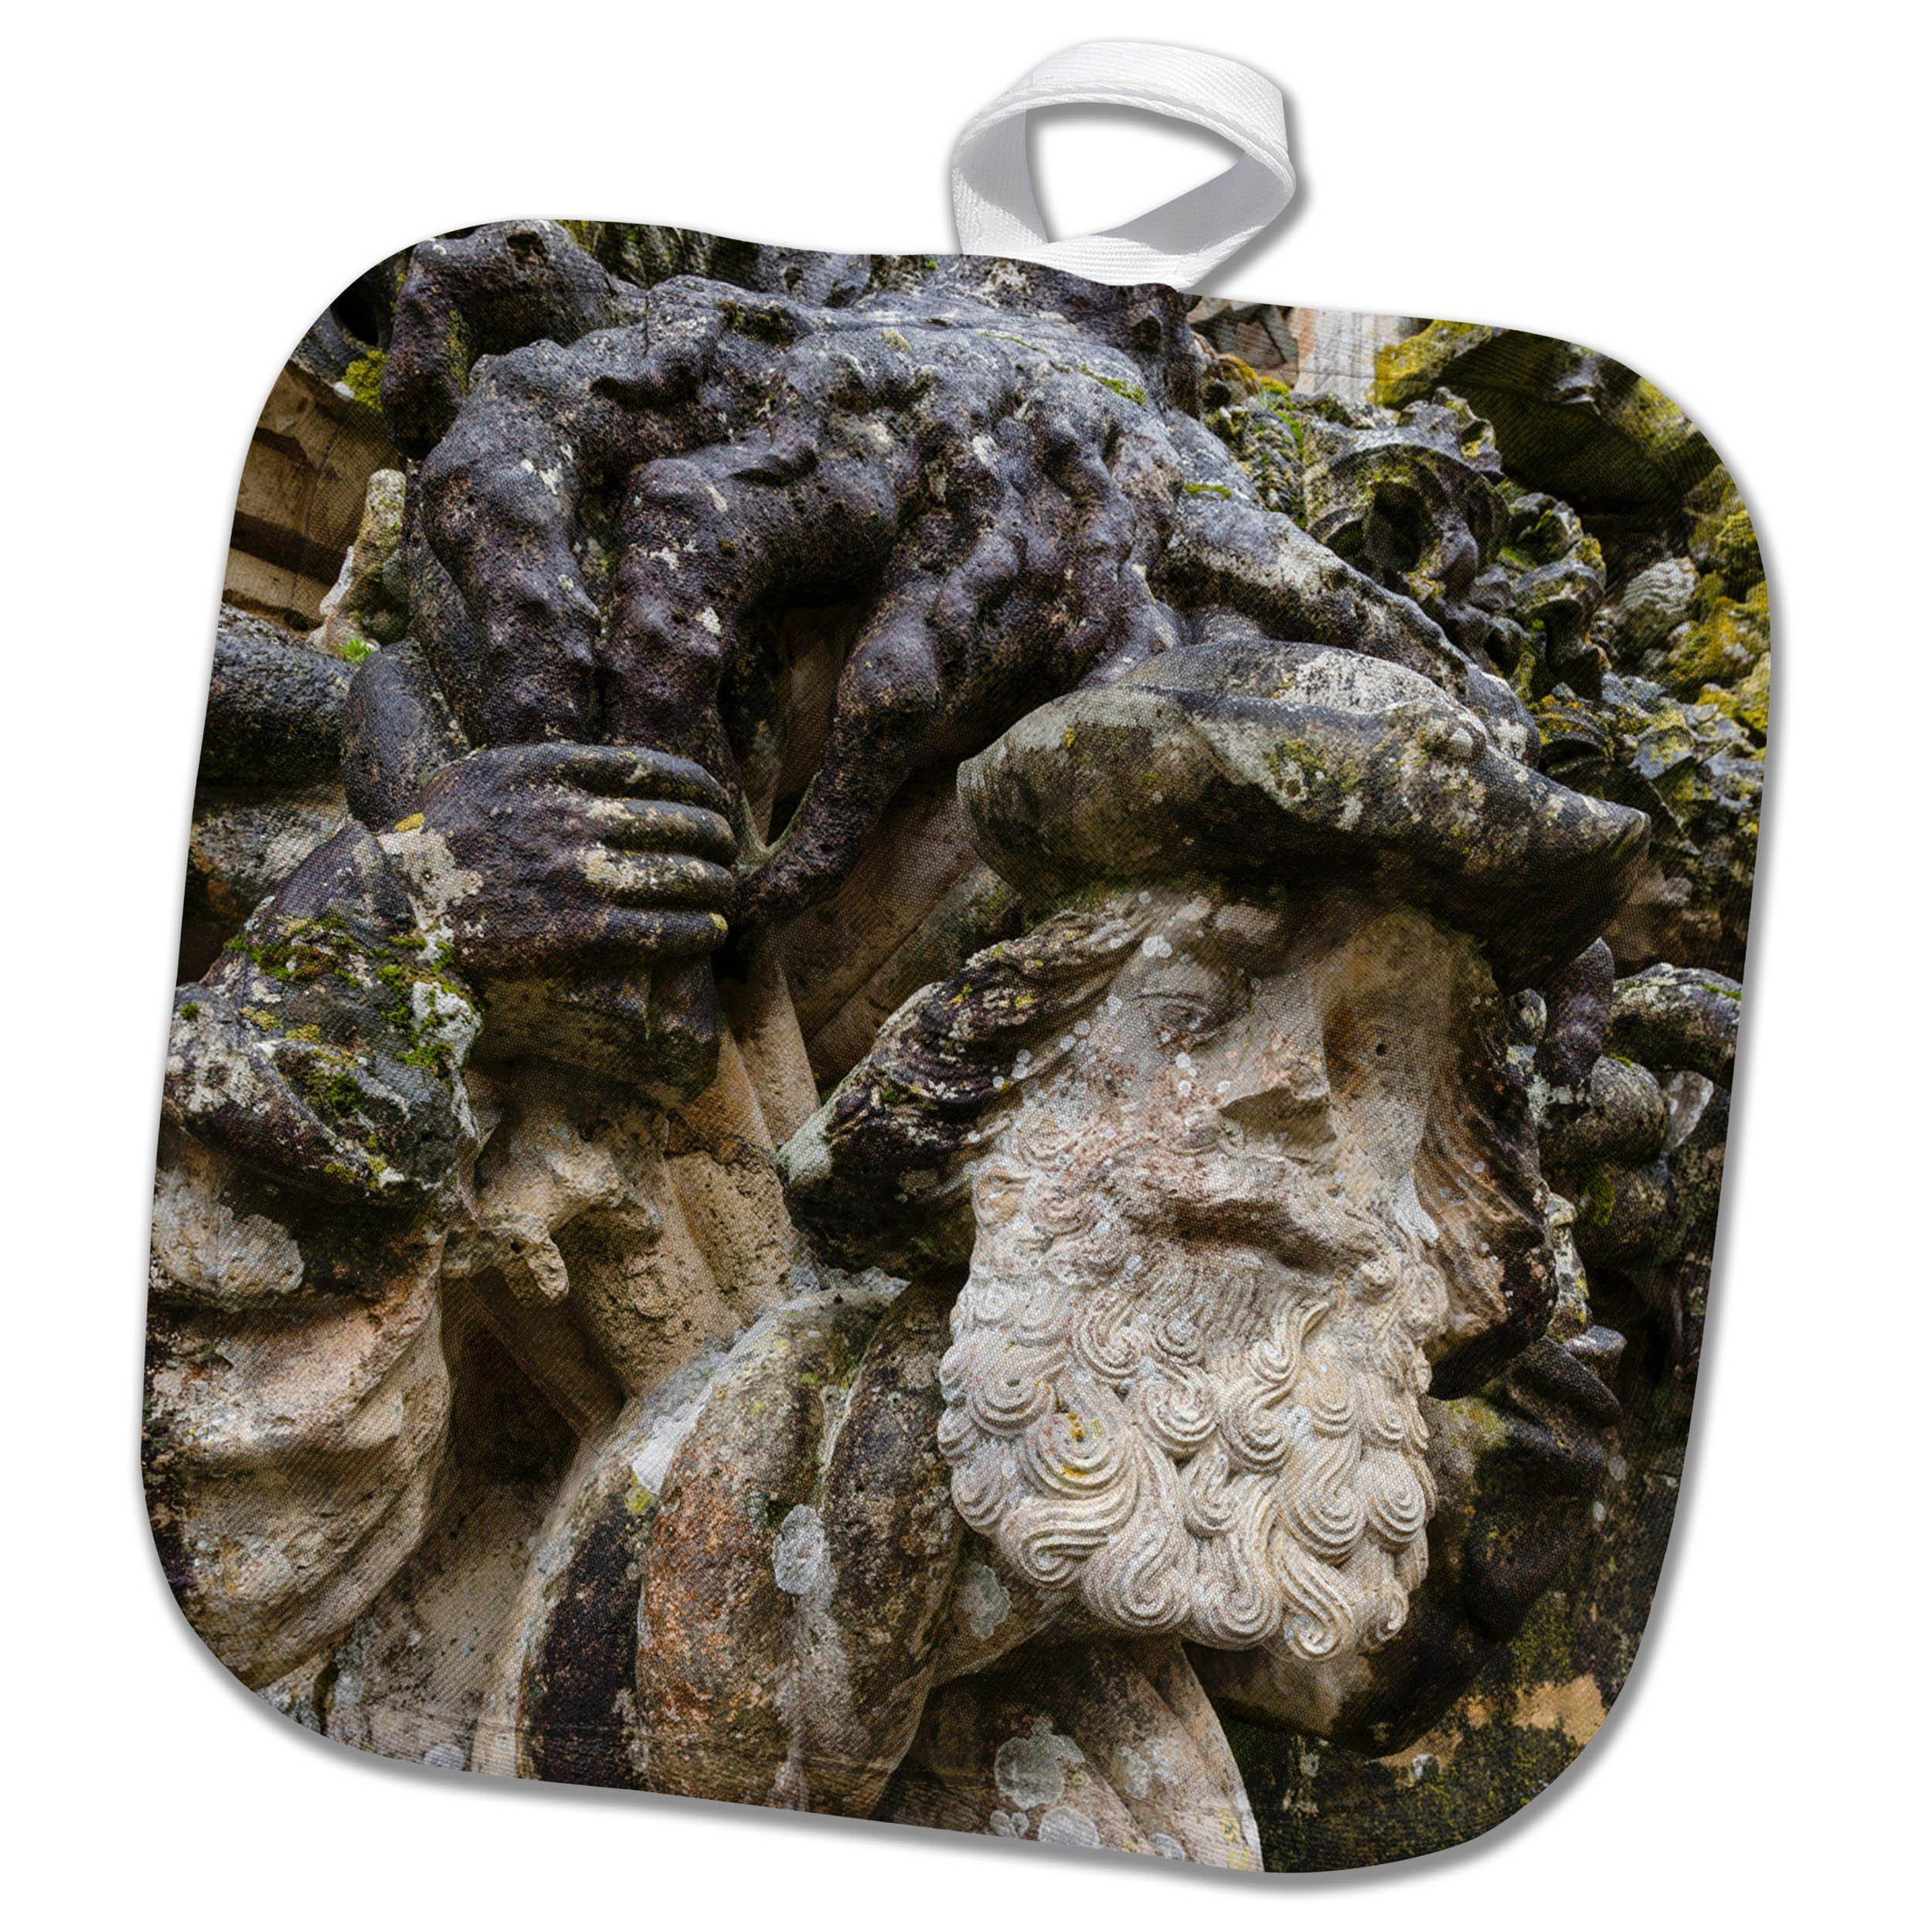 3dRose Danita Delimont - Religion - Face sculpture, Manueline Window, Convent of Christ, Tomar, Portugal - 8x8 Potholder (phl_277808_1)